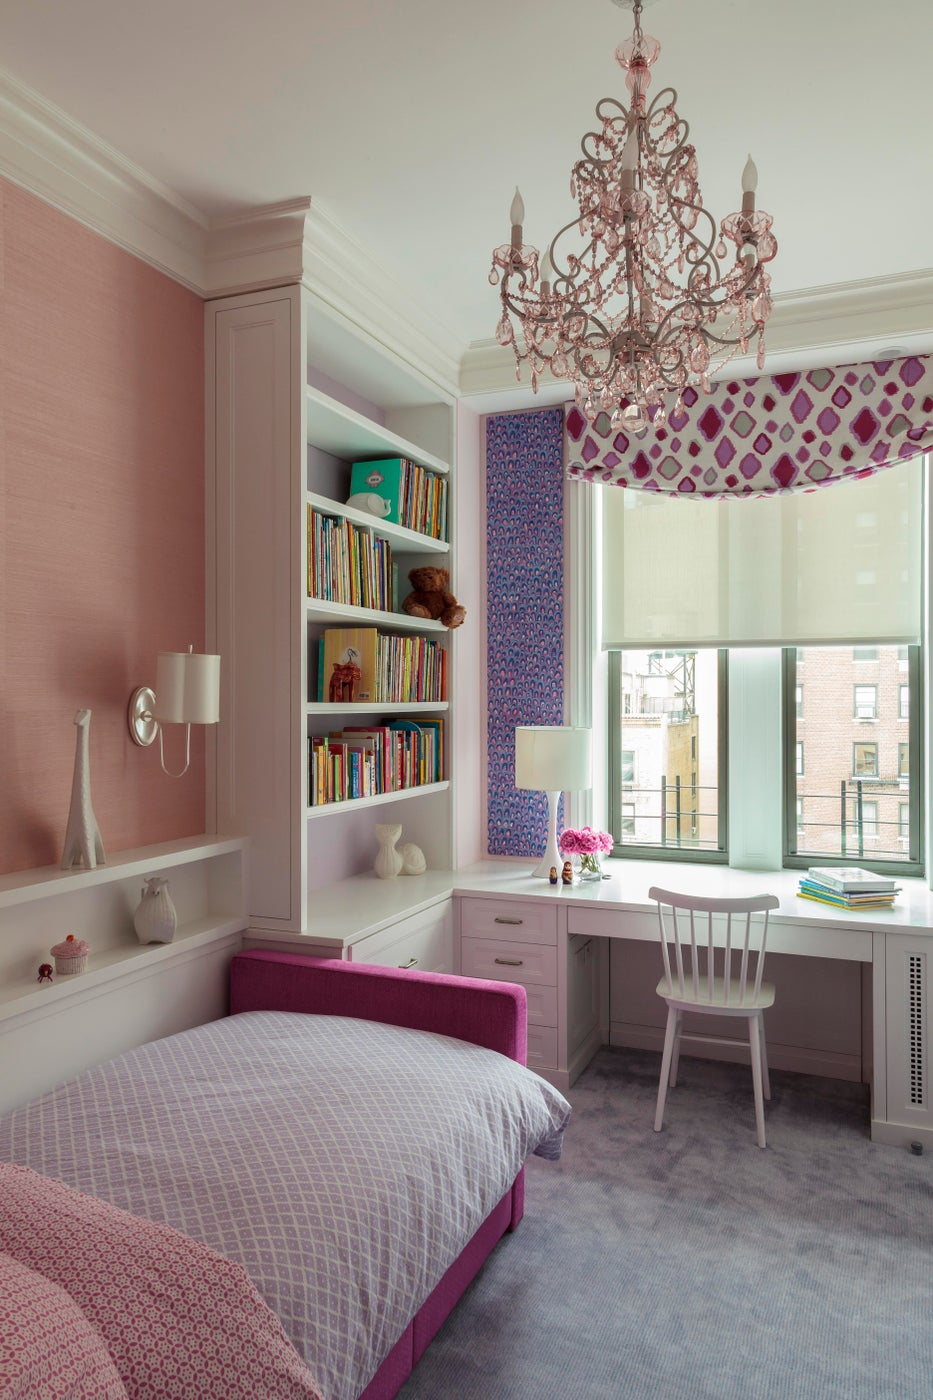 Park Avenue Residence, Girl's Bedroom w/ pastel palette and whimsical chandelier